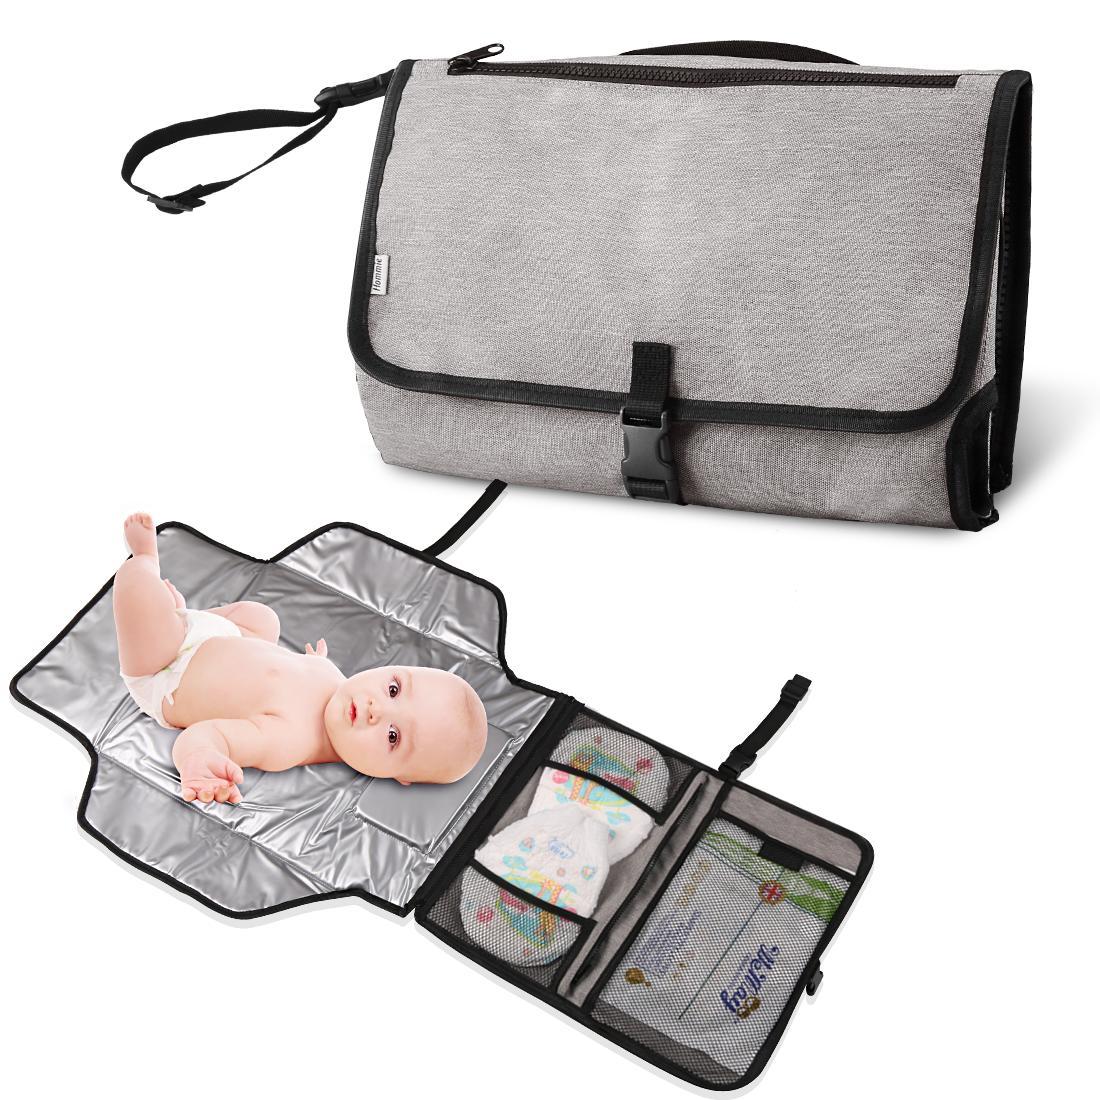 Hommie おむつ替えシート 赤ちゃん ポータブル おむつ替えマット 取り外し 折りたたみ 可能 防水 衛生用品 洗濯可 外出 旅行 持ち運び 出産祝い